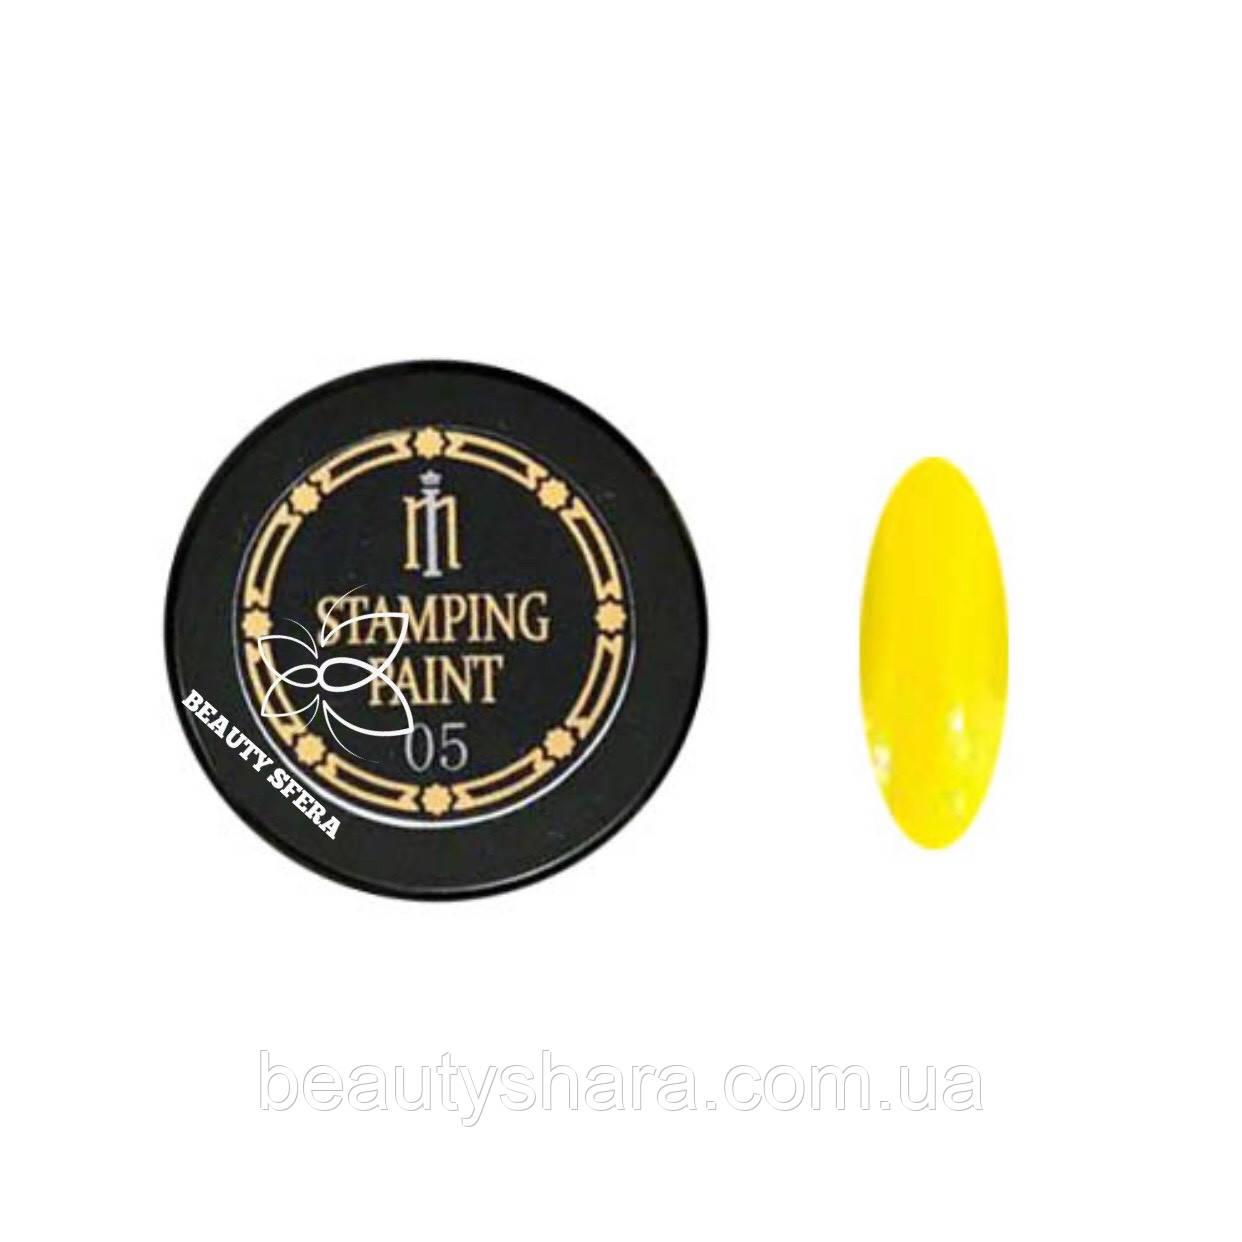 Краска для стемпинга Milano Stamping Paint 05